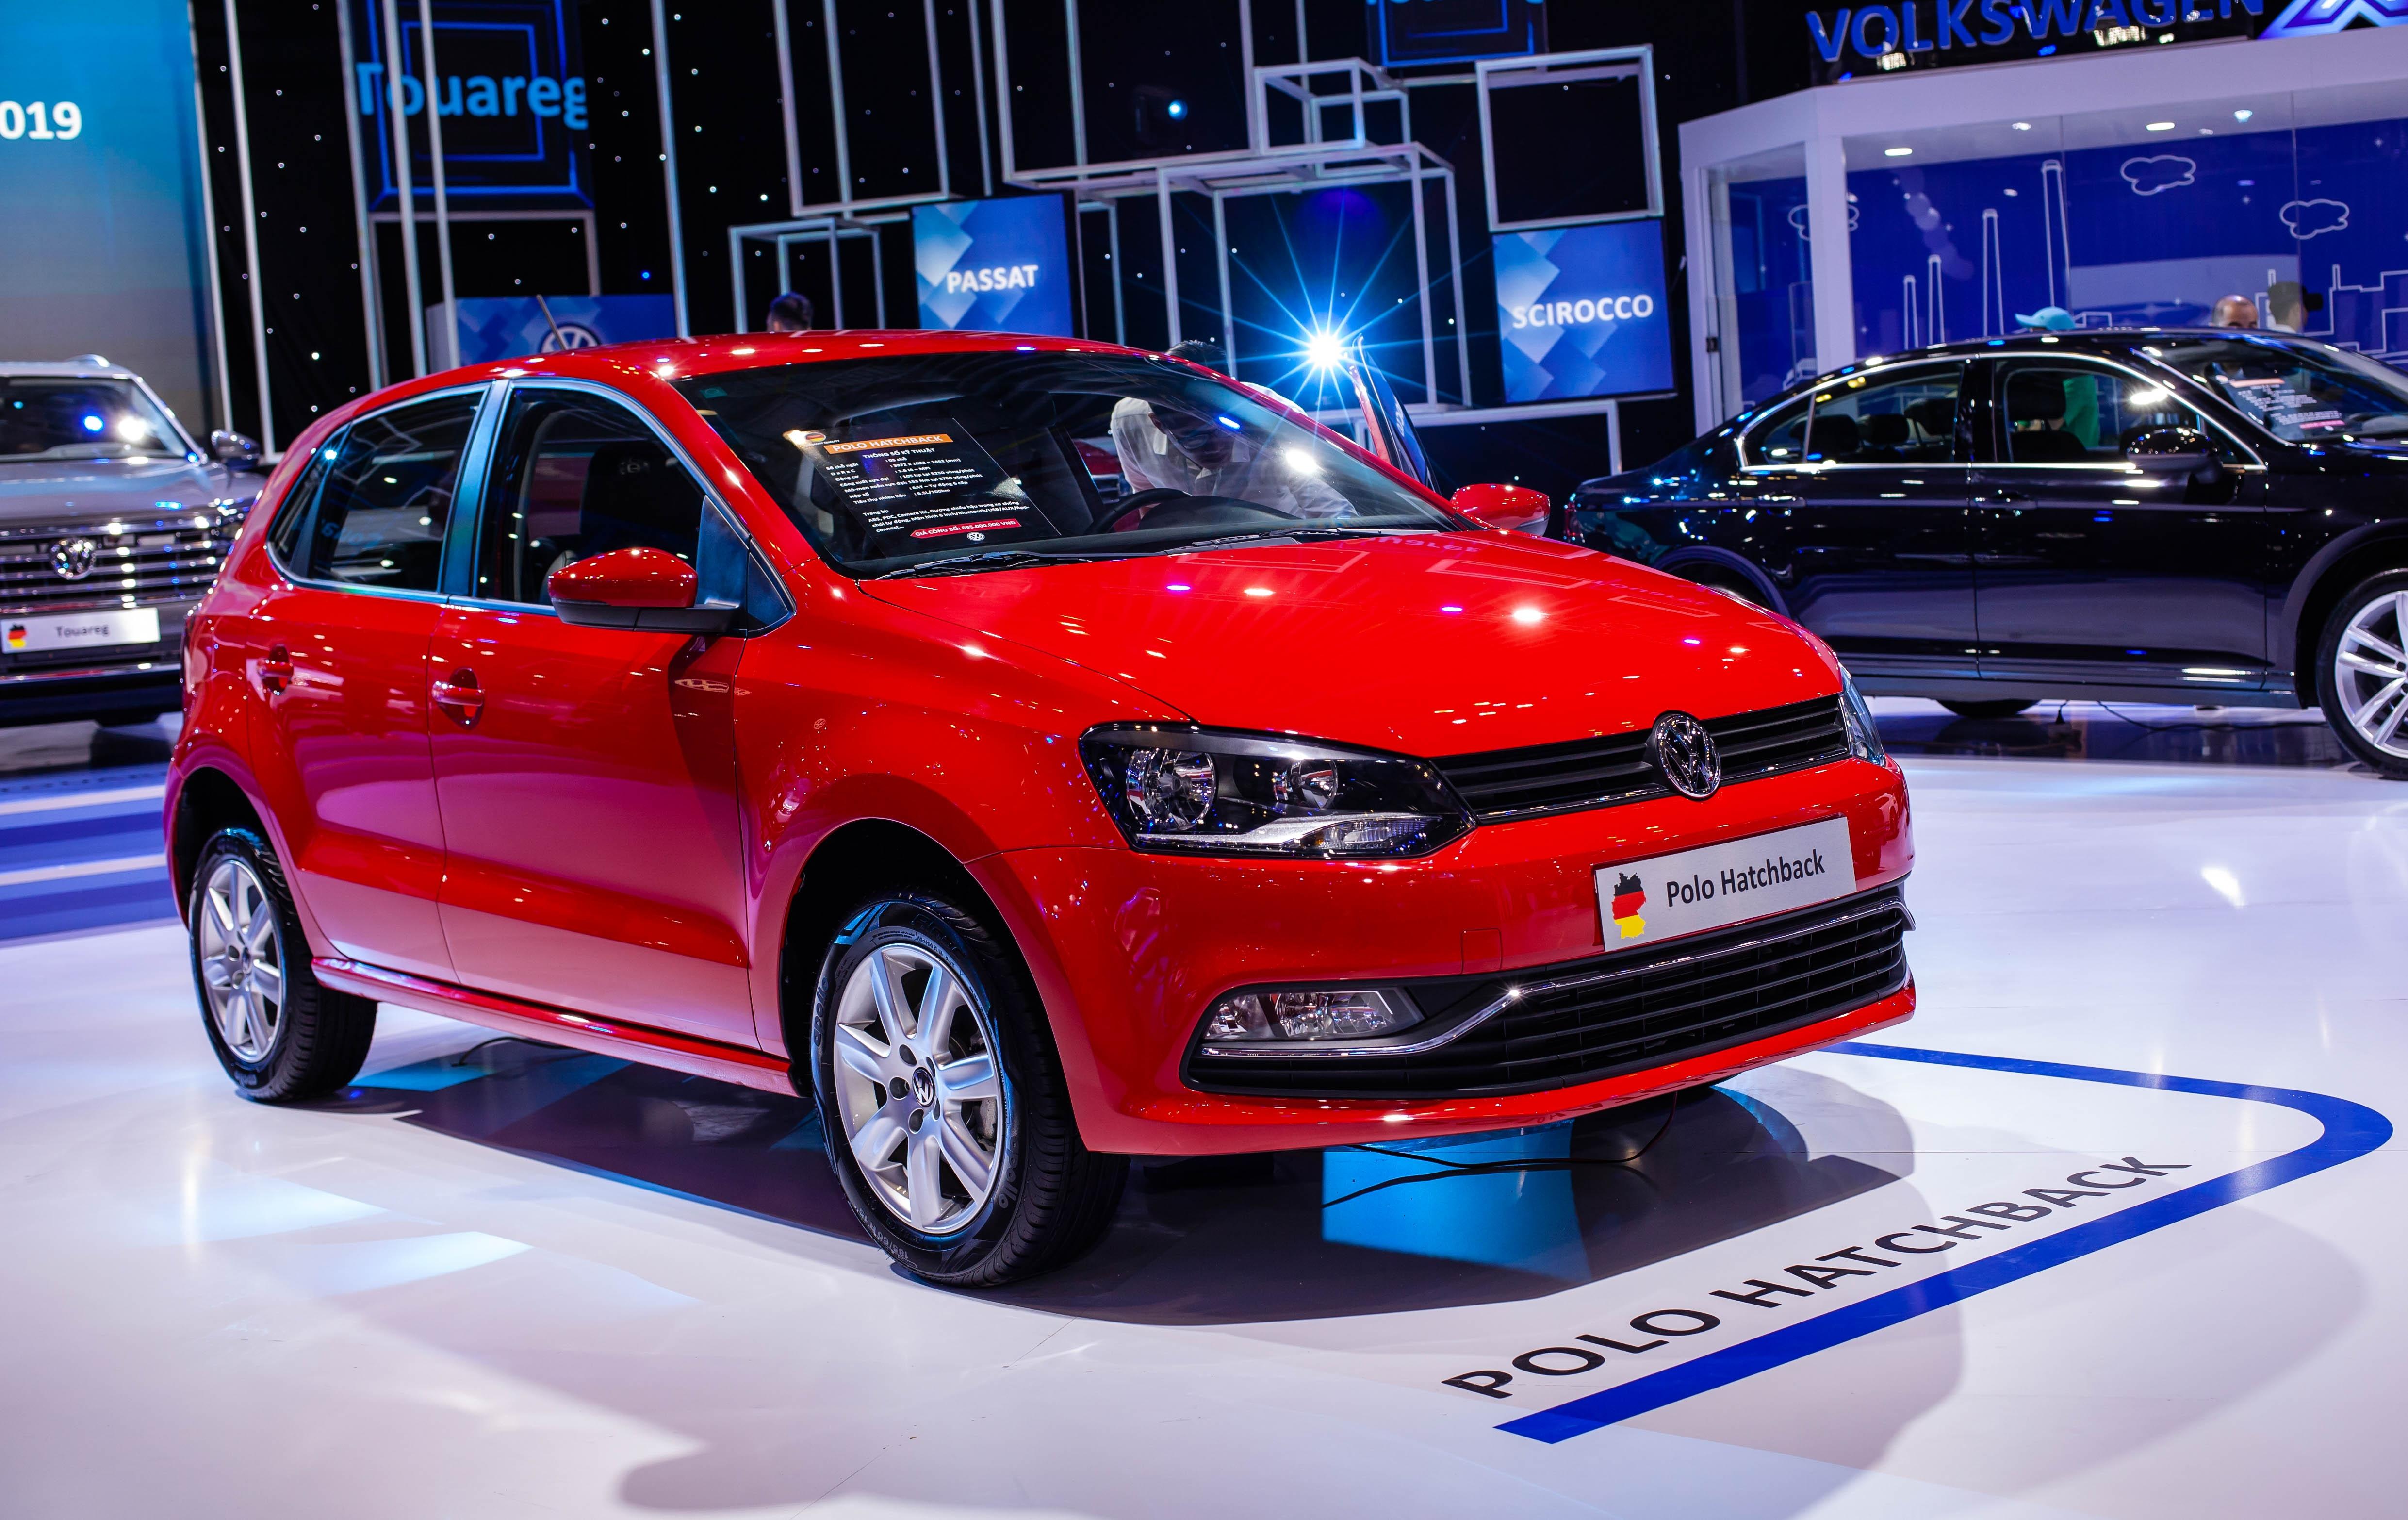 Volkswagen tai VMS 2019 - vang bong xe moi hinh anh 7